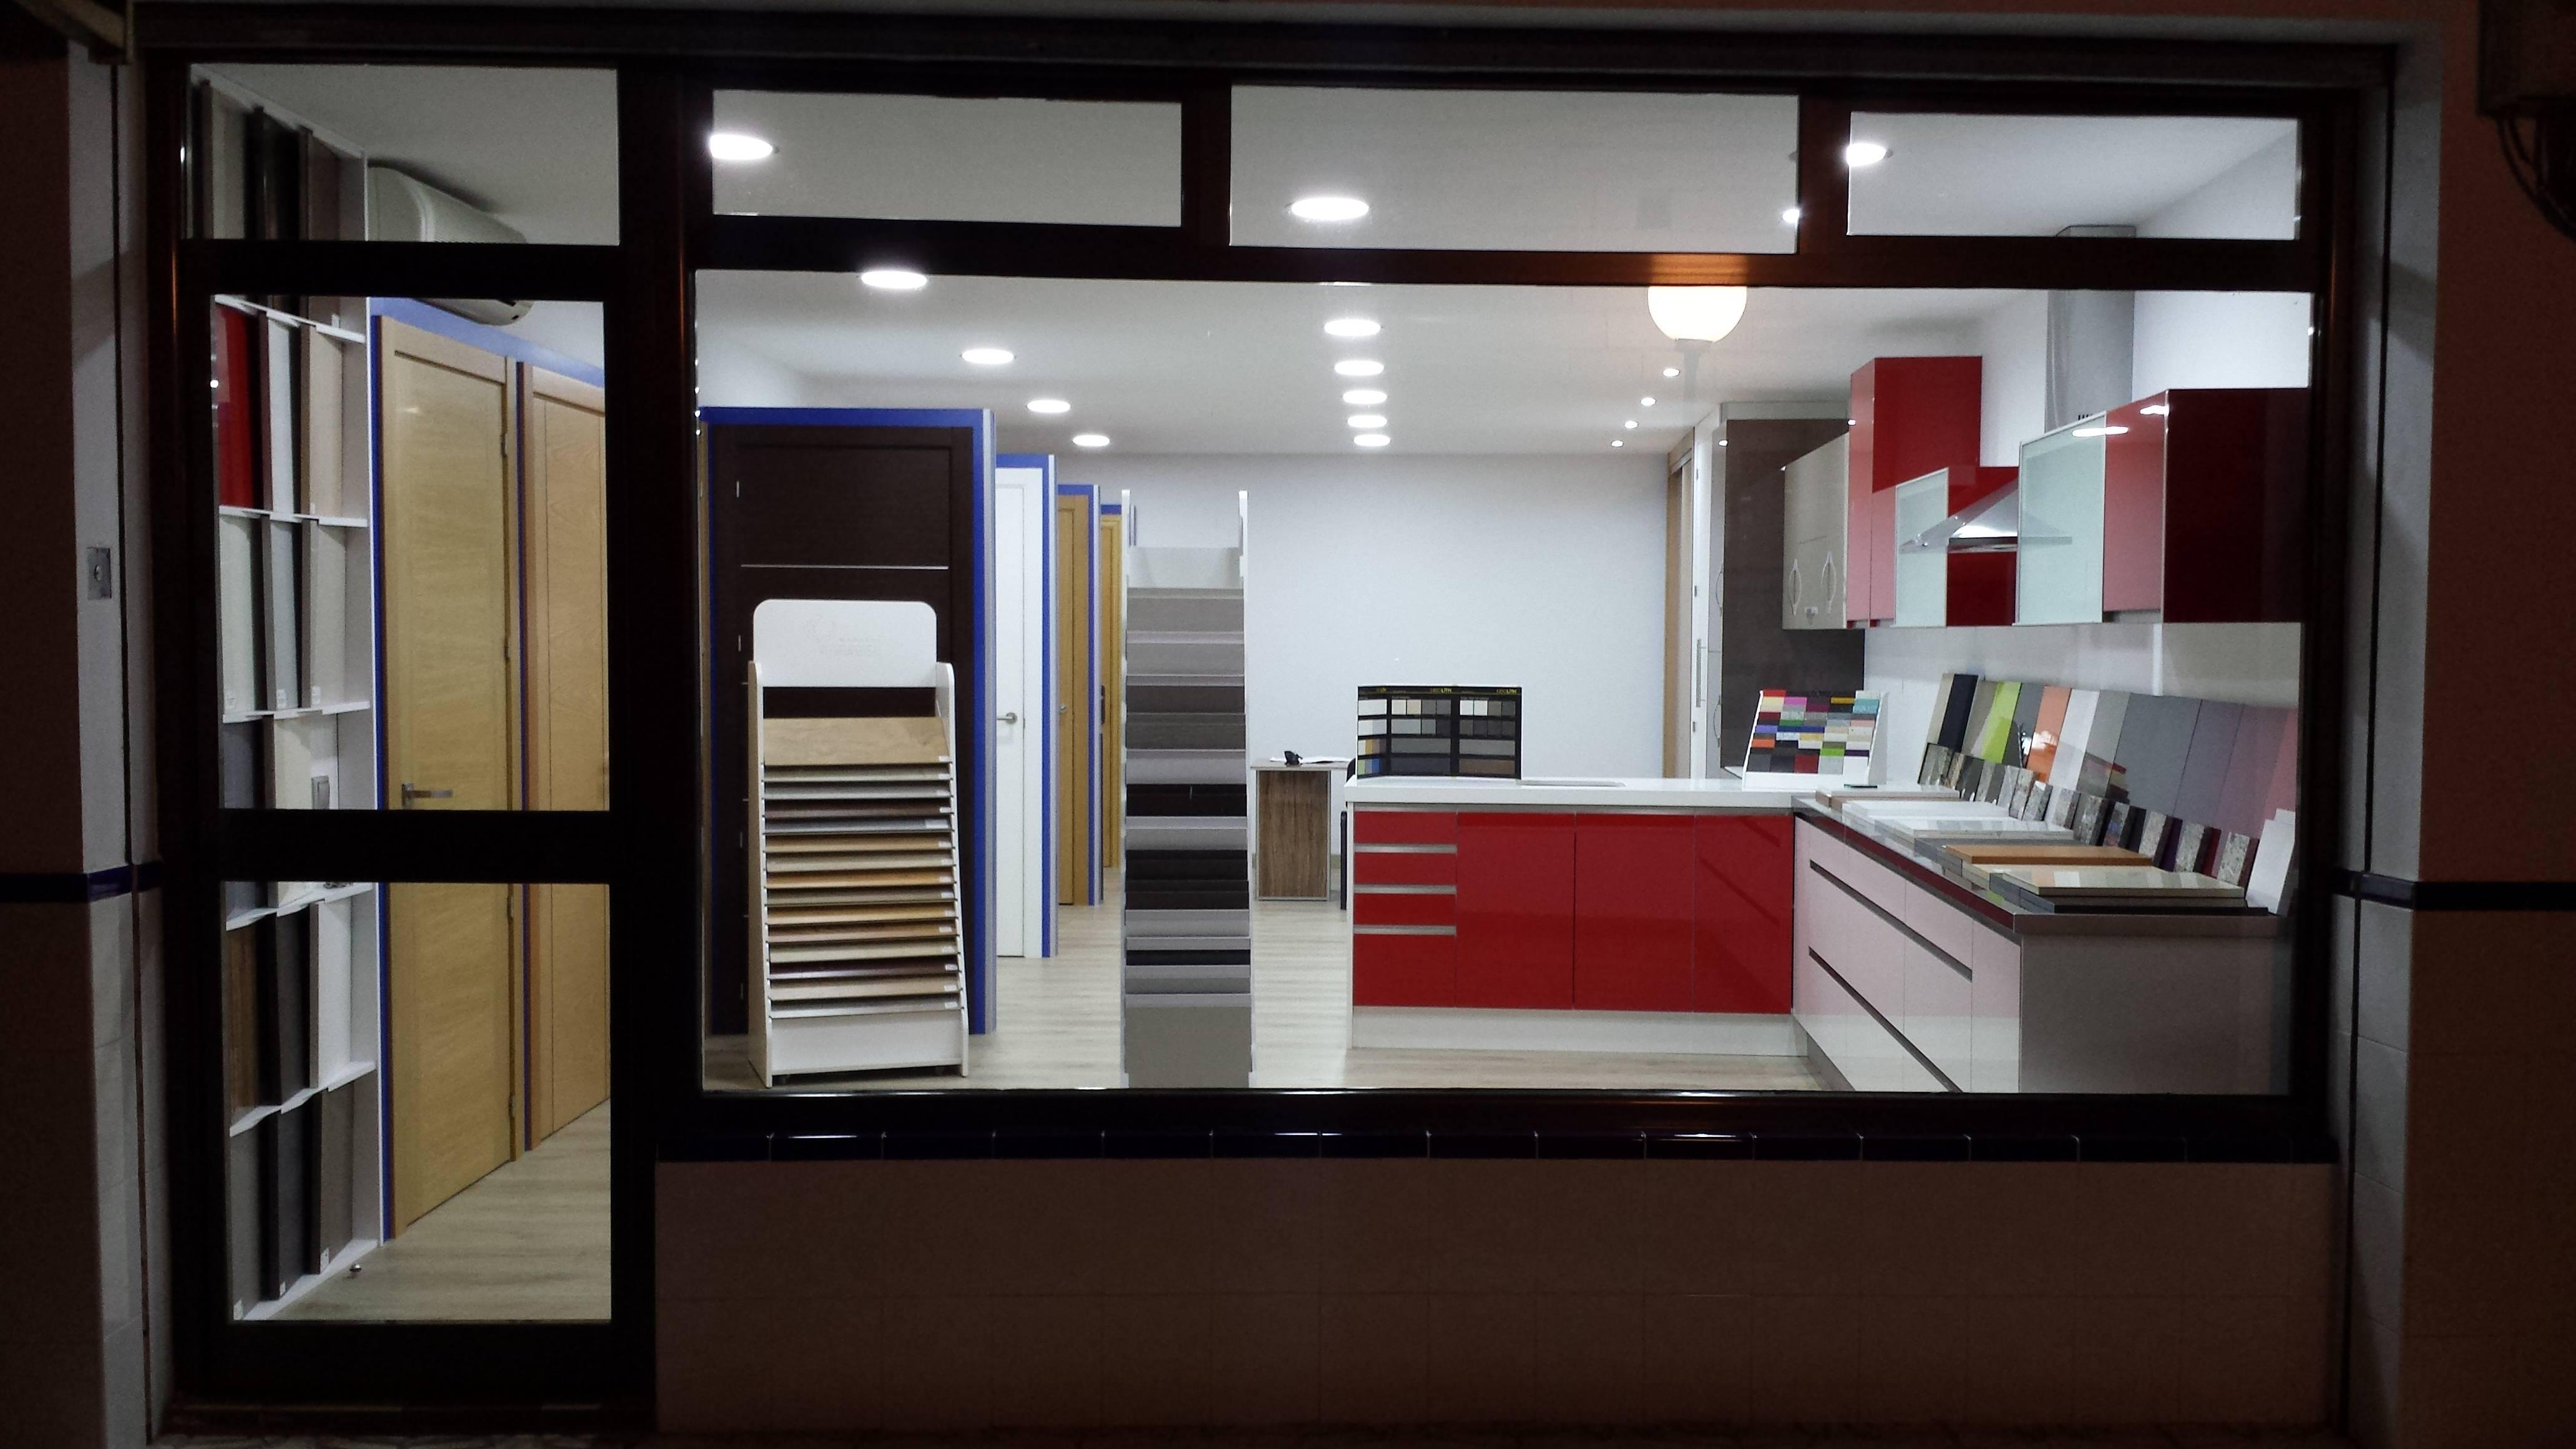 La empresa carpinter a de madera en fuengirola - Cocinas fuengirola ...